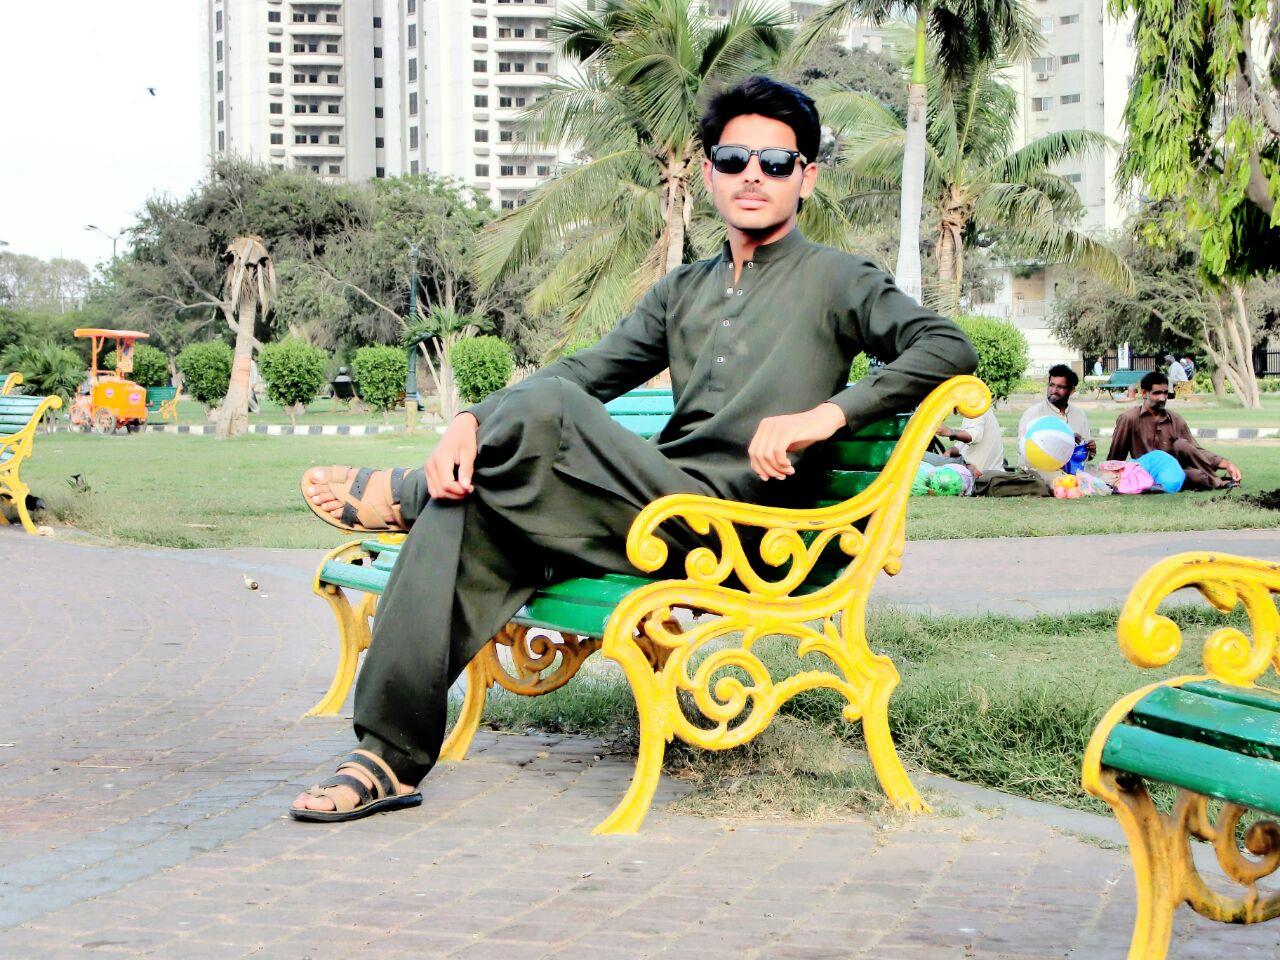 Muhammad Kamran Photo Editing, Photography, Photoshop, Manufacturing, 3D Printing